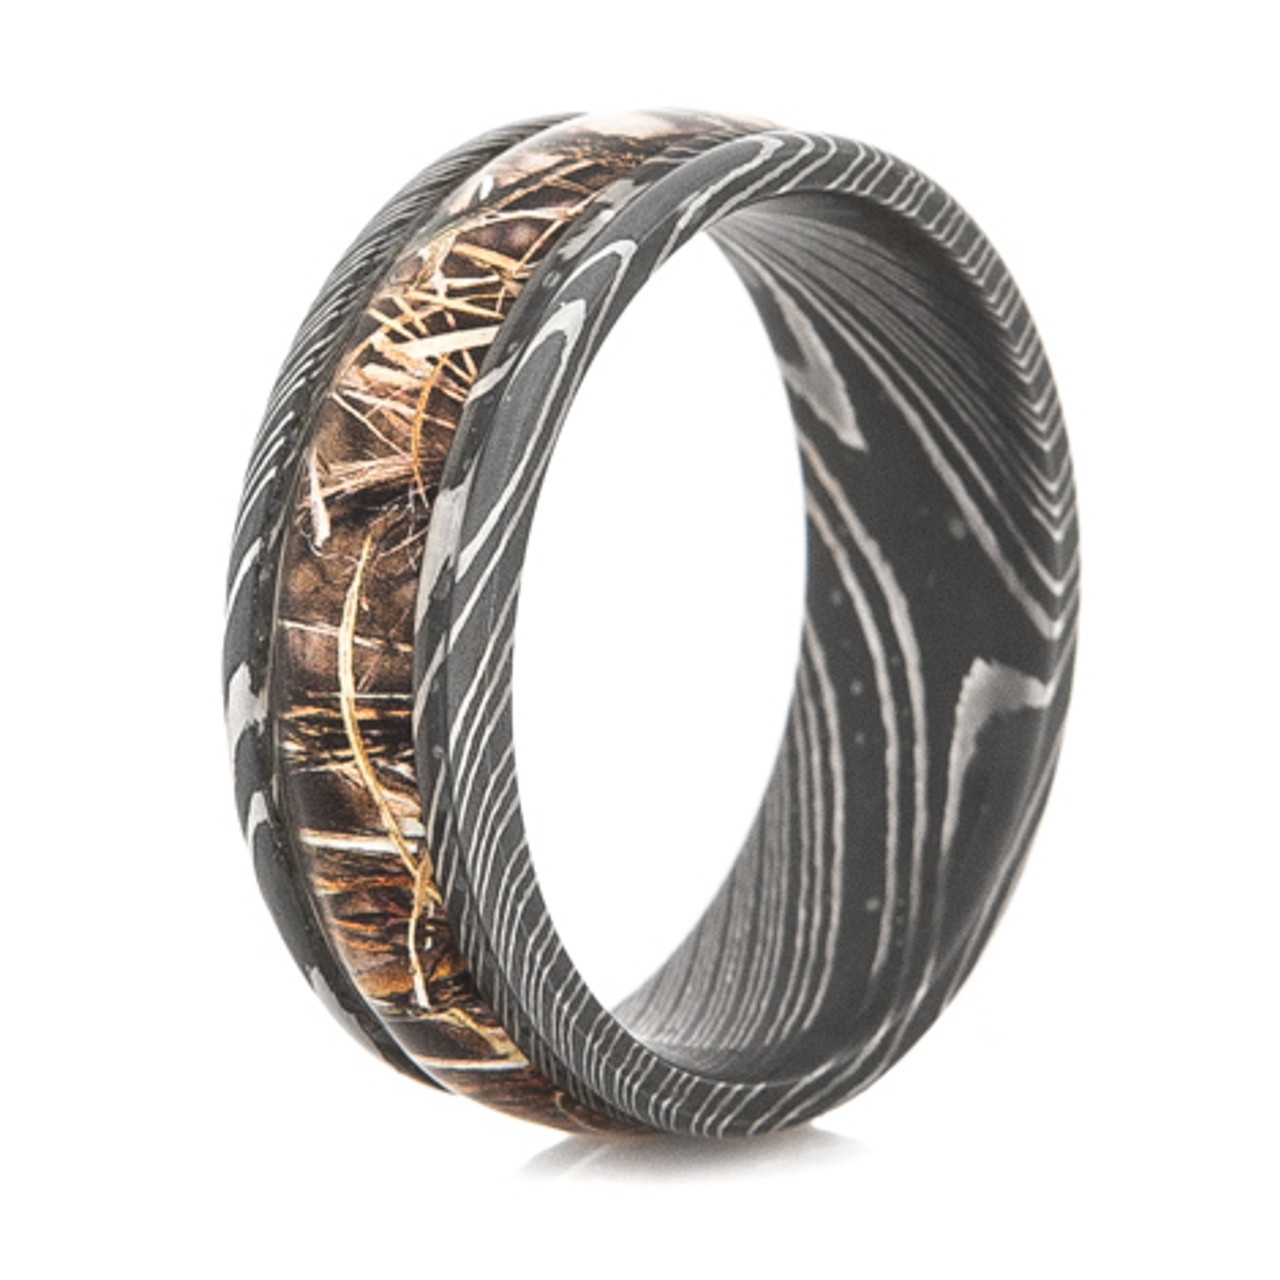 Mens Damascus Steel Realtree Camo Ring Titanium Buzz